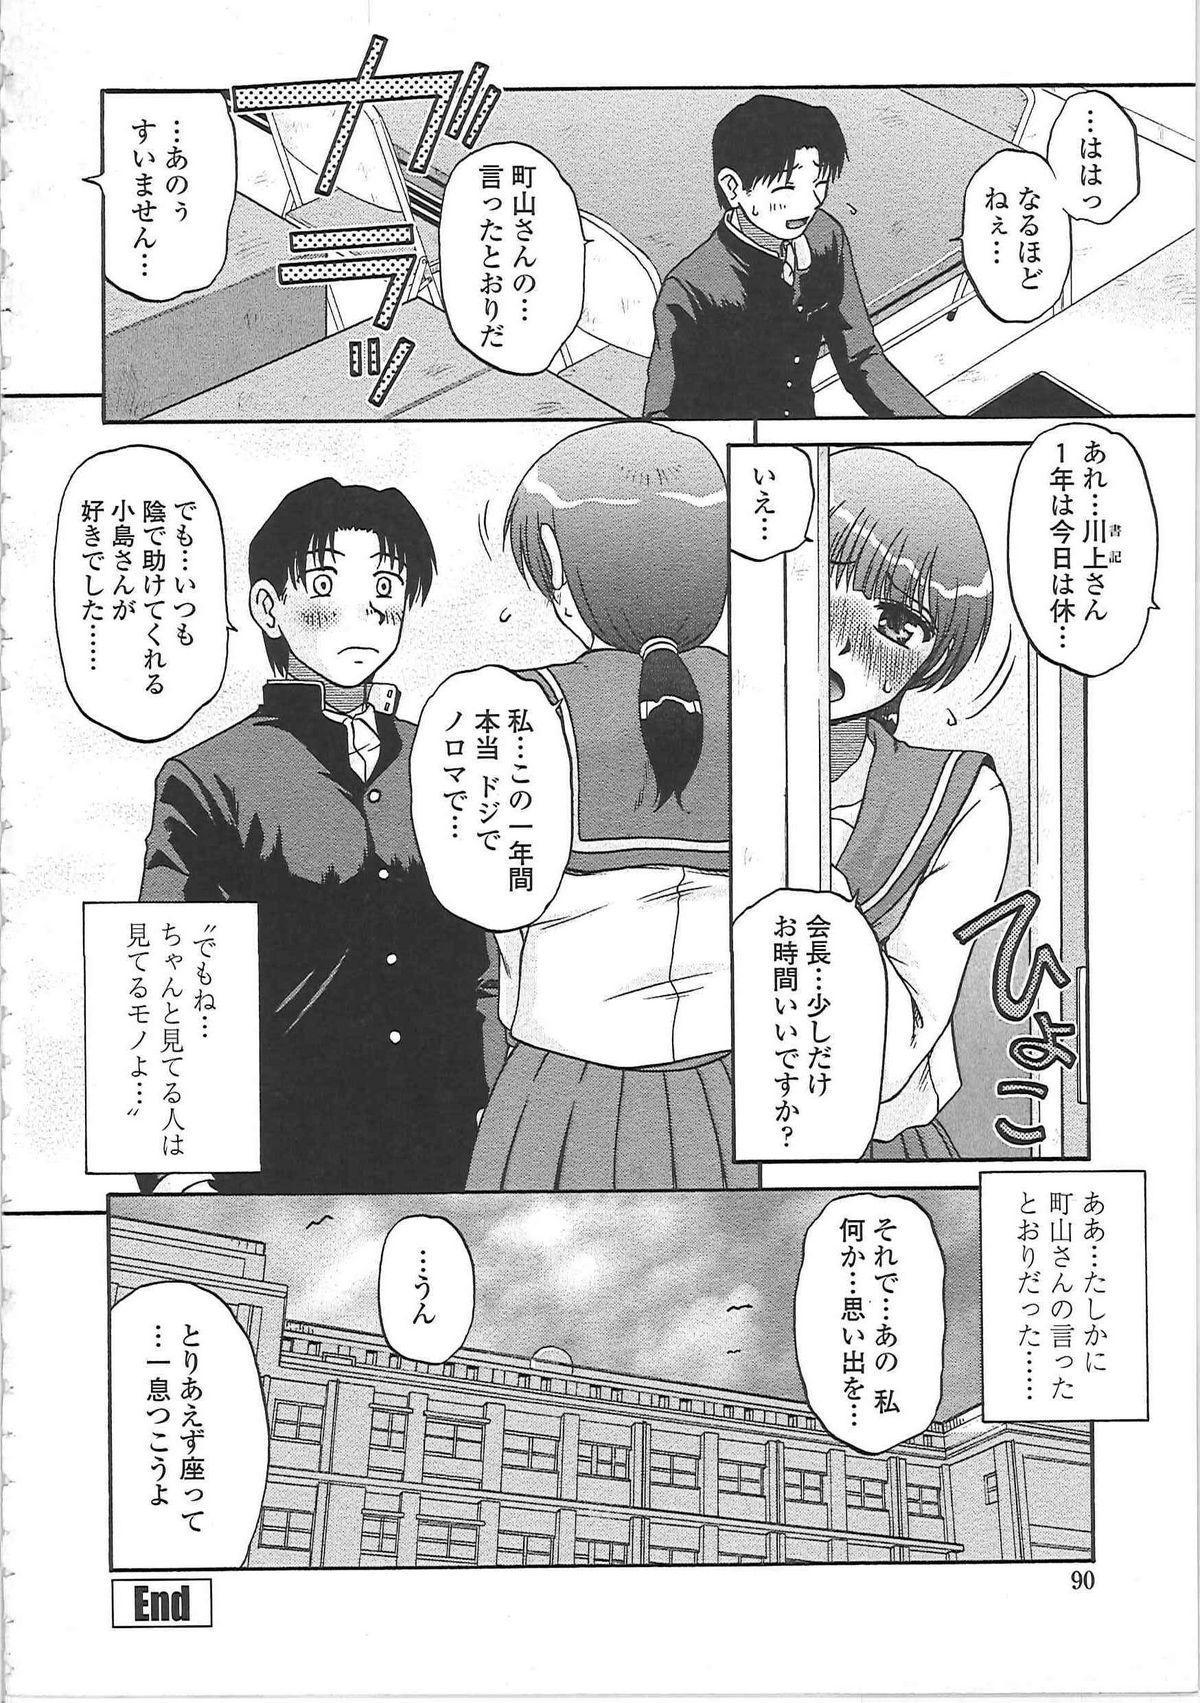 Nikuzuma Tsuushin - Erotic Wife Communication 94